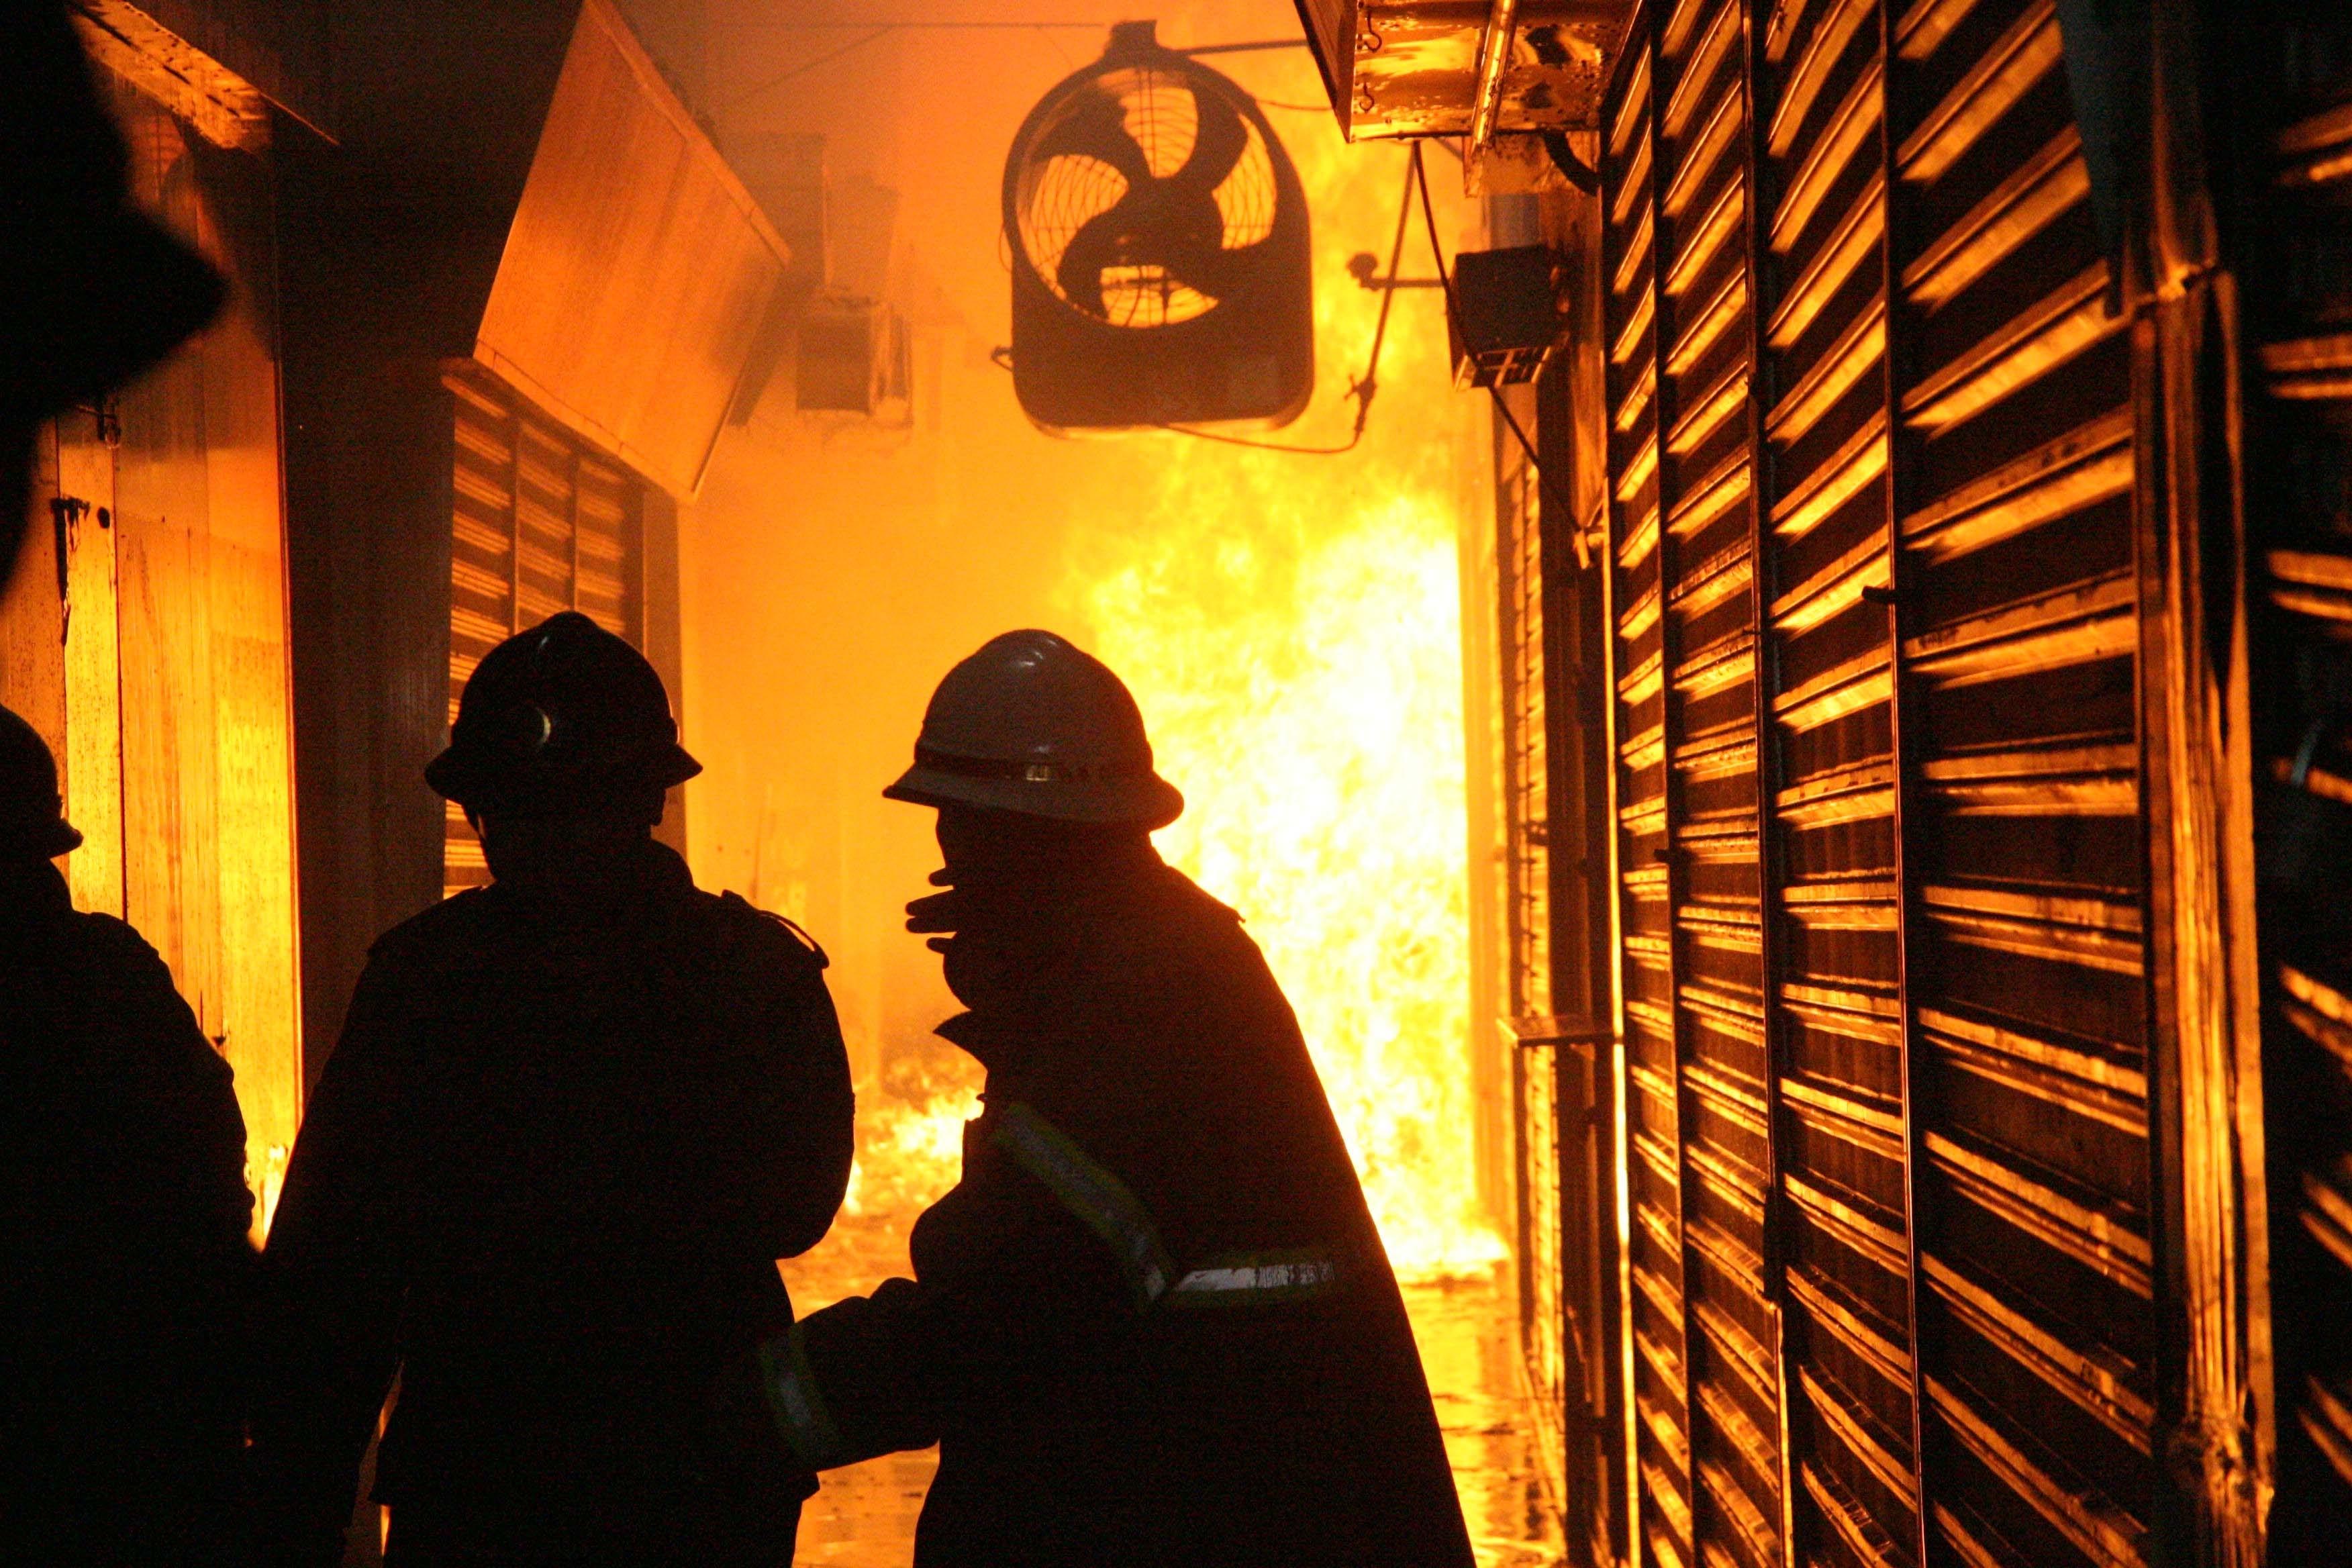 Bombeiros dentro do mercado tentam controlar incêndio